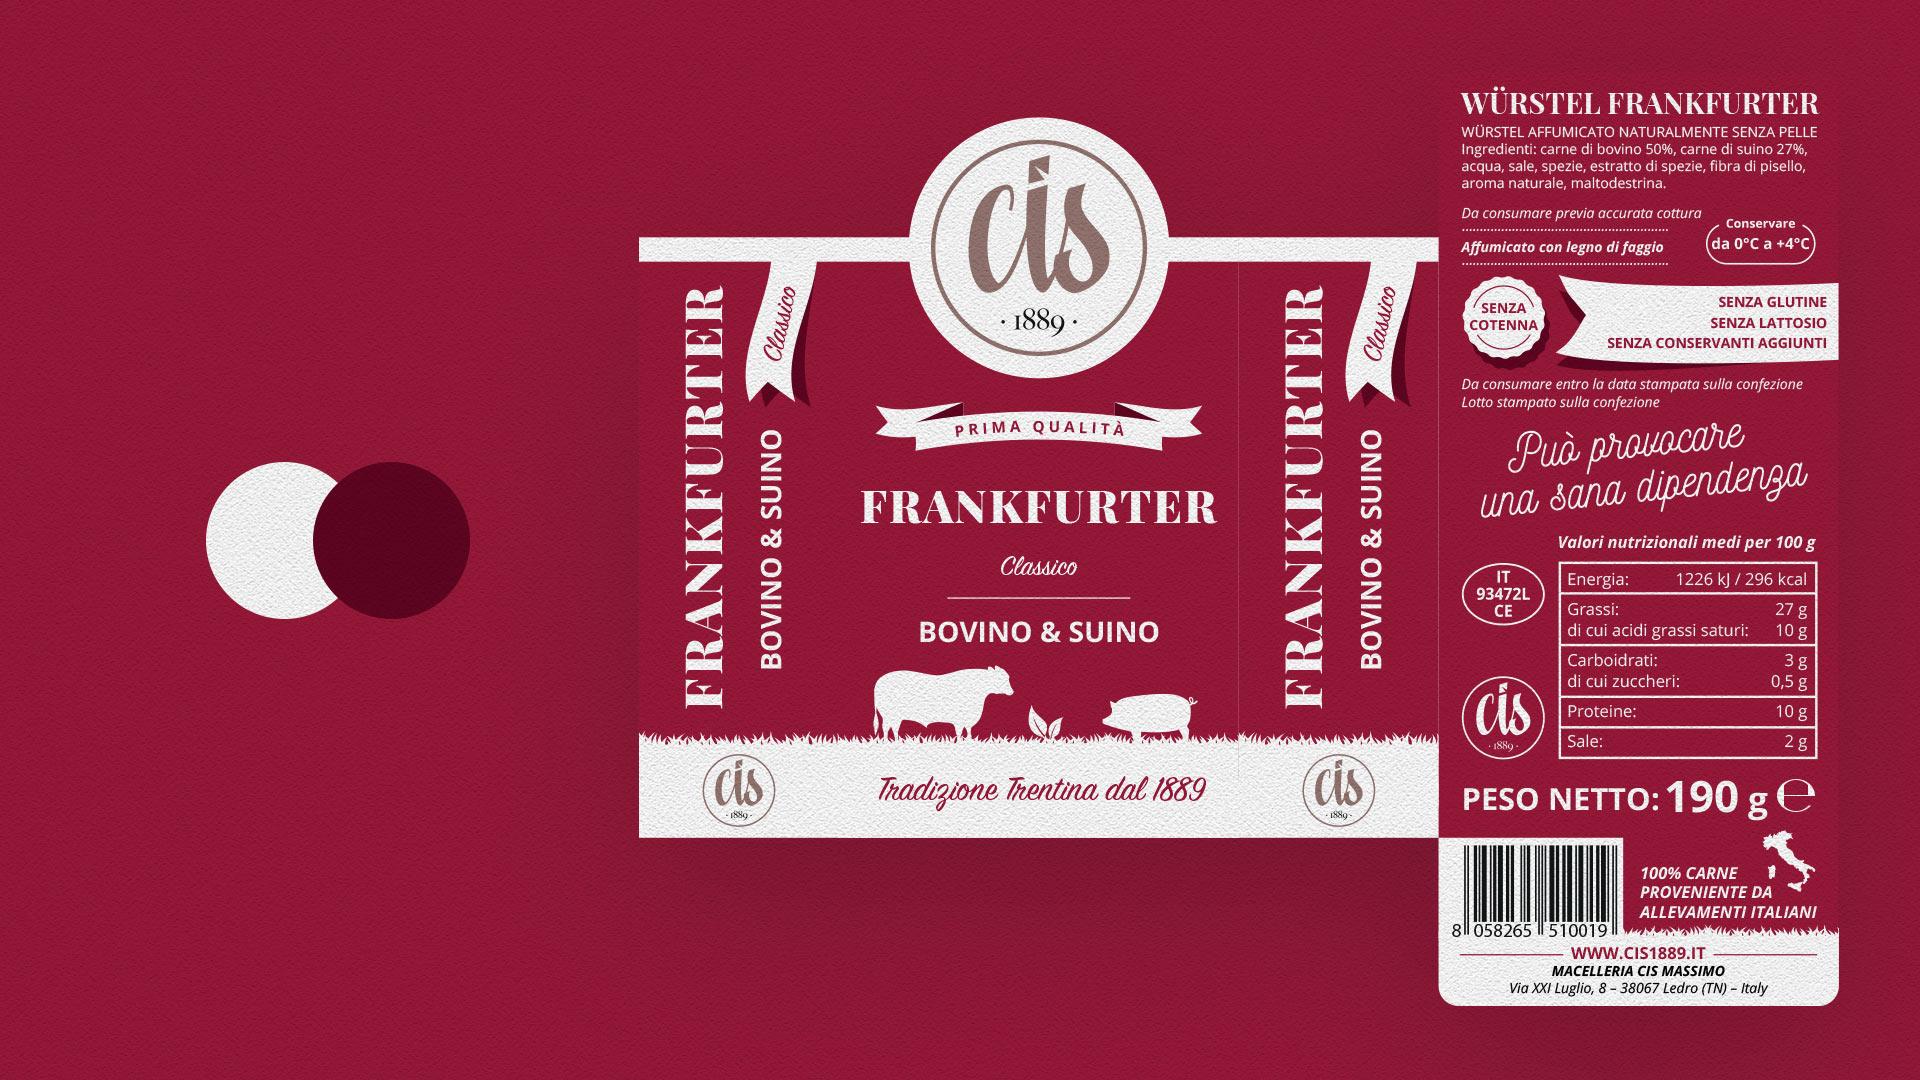 frankfurter suino bovino CIS packaging grafico milano